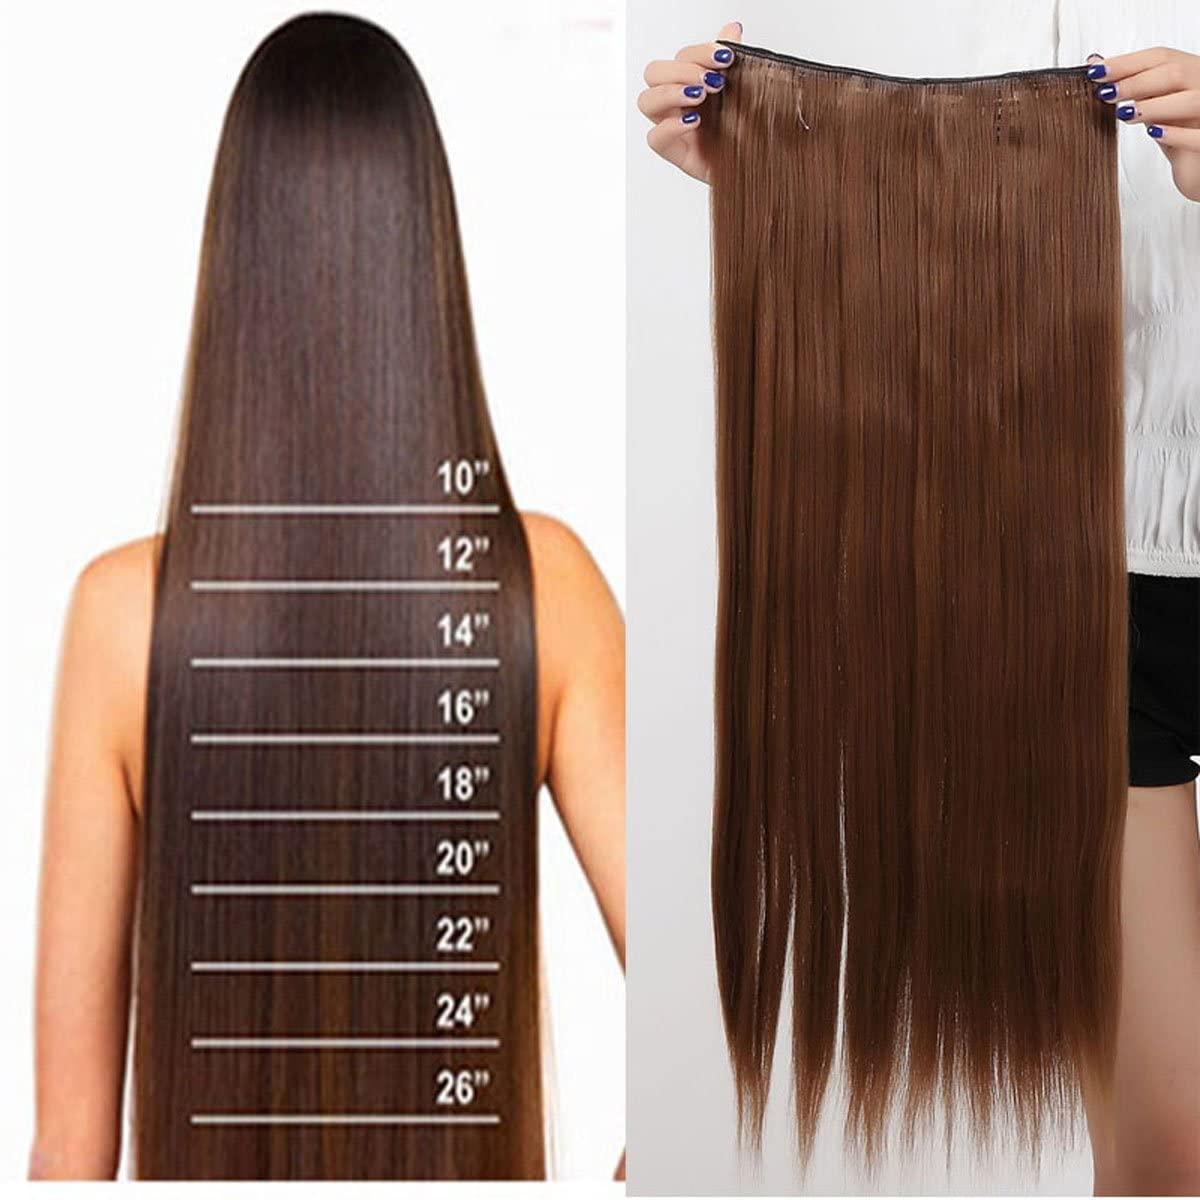 26 Inch Model Ideas – Tips For Long Hair